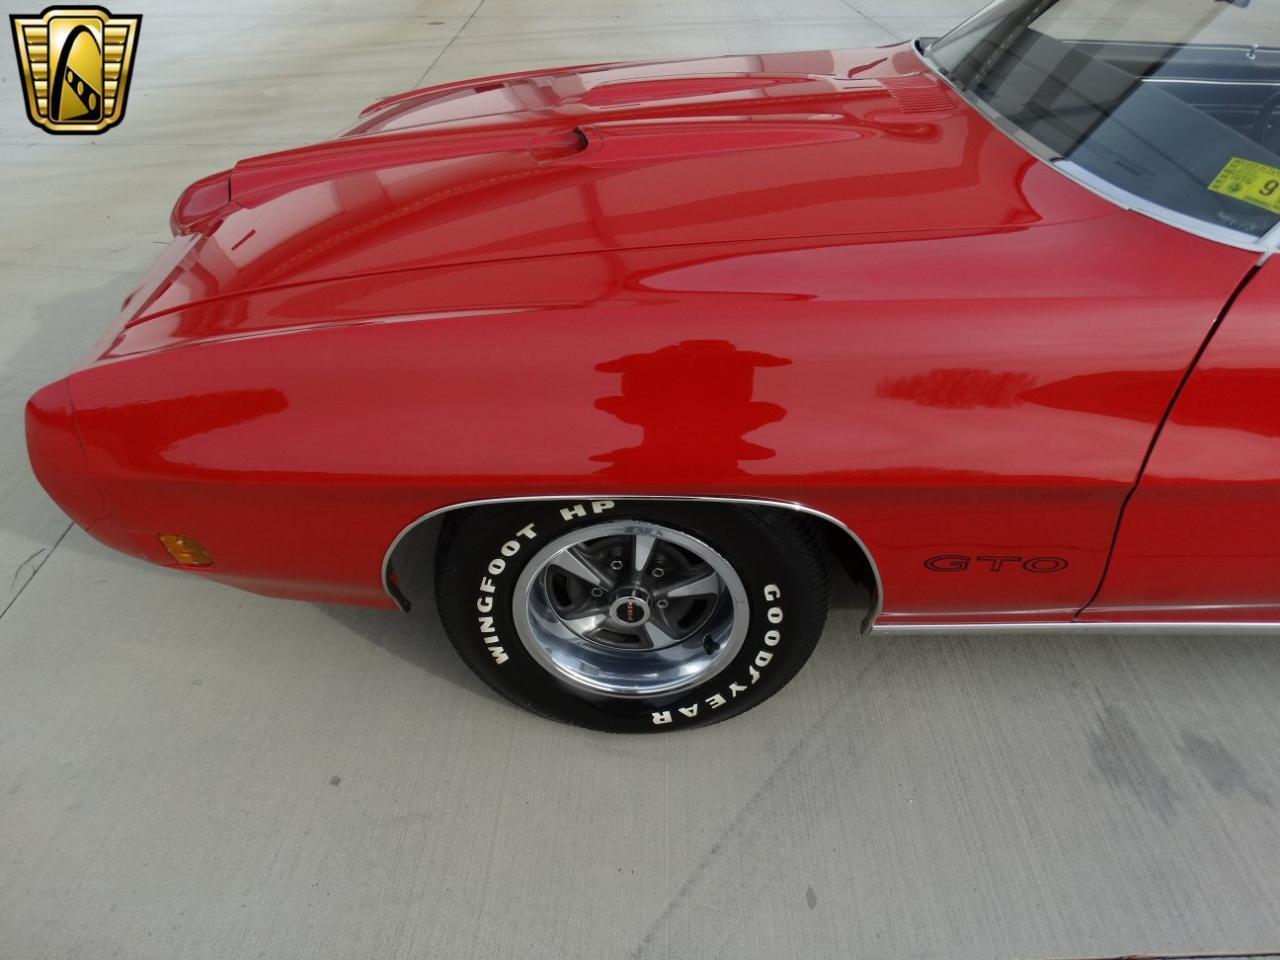 Large Picture of Classic 1970 GTO located in Alpharetta Georgia - $71,000.00 - KF5T